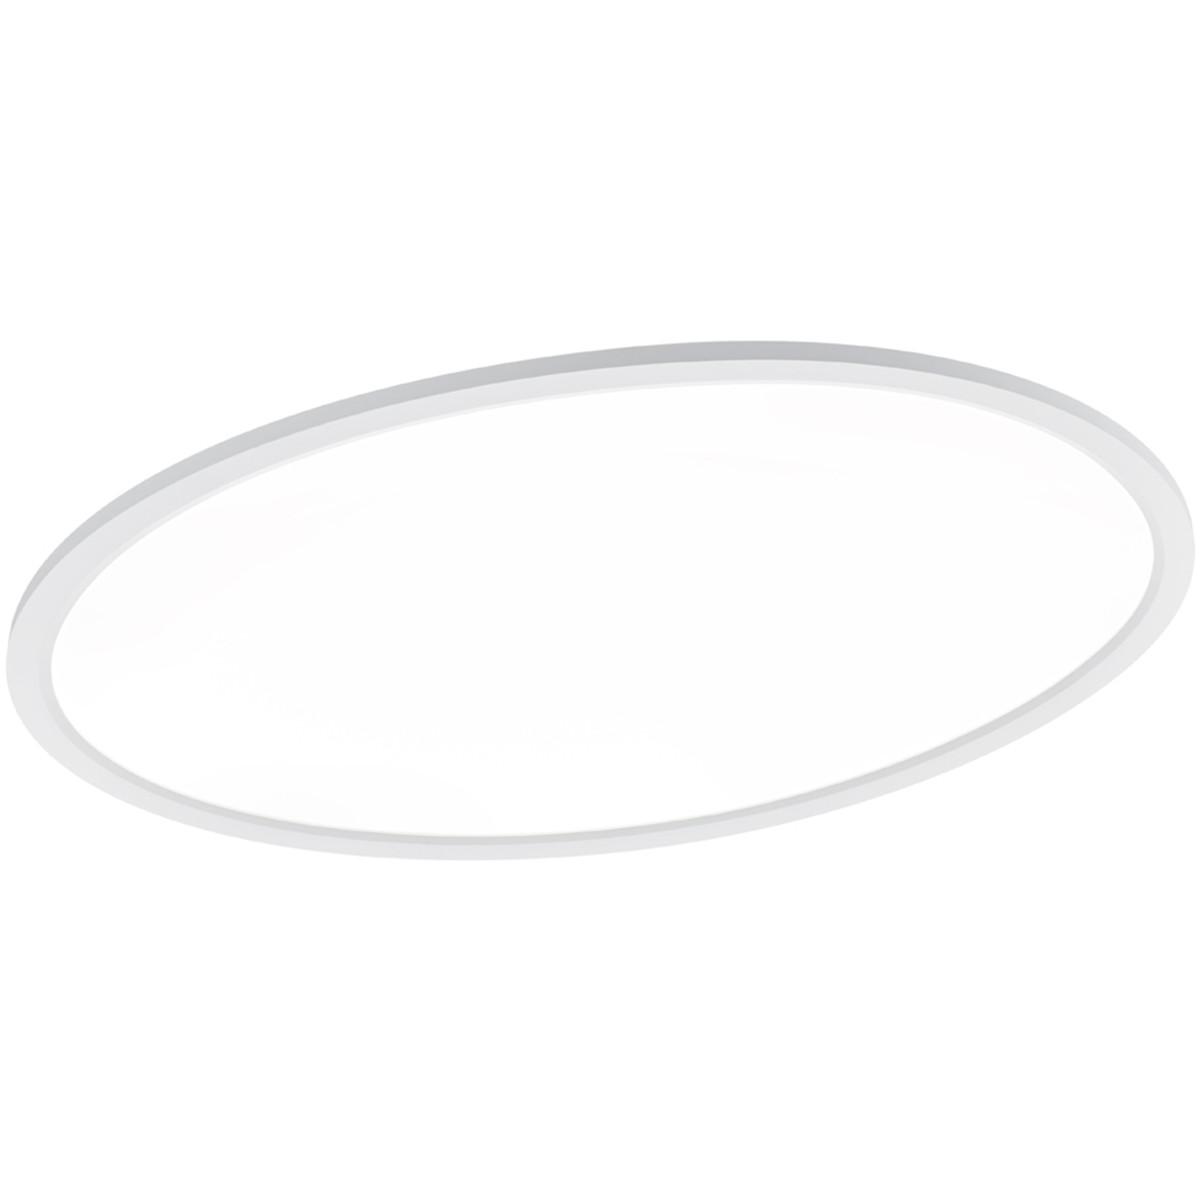 LED Plafondlamp - Trion Astinor - Opbouw Ovaal - 24W - Warm Wit 3000K - Mat Wit - Aluminium